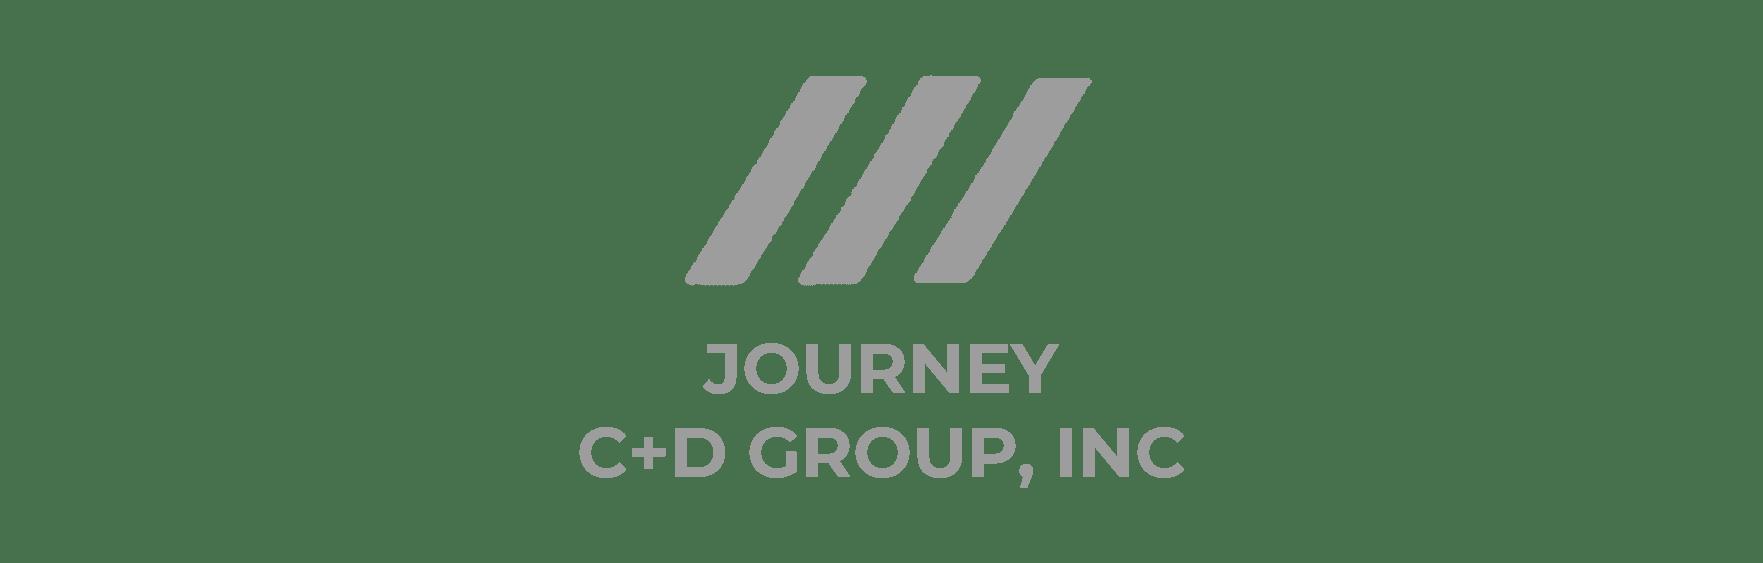 journey C+D Group Logo